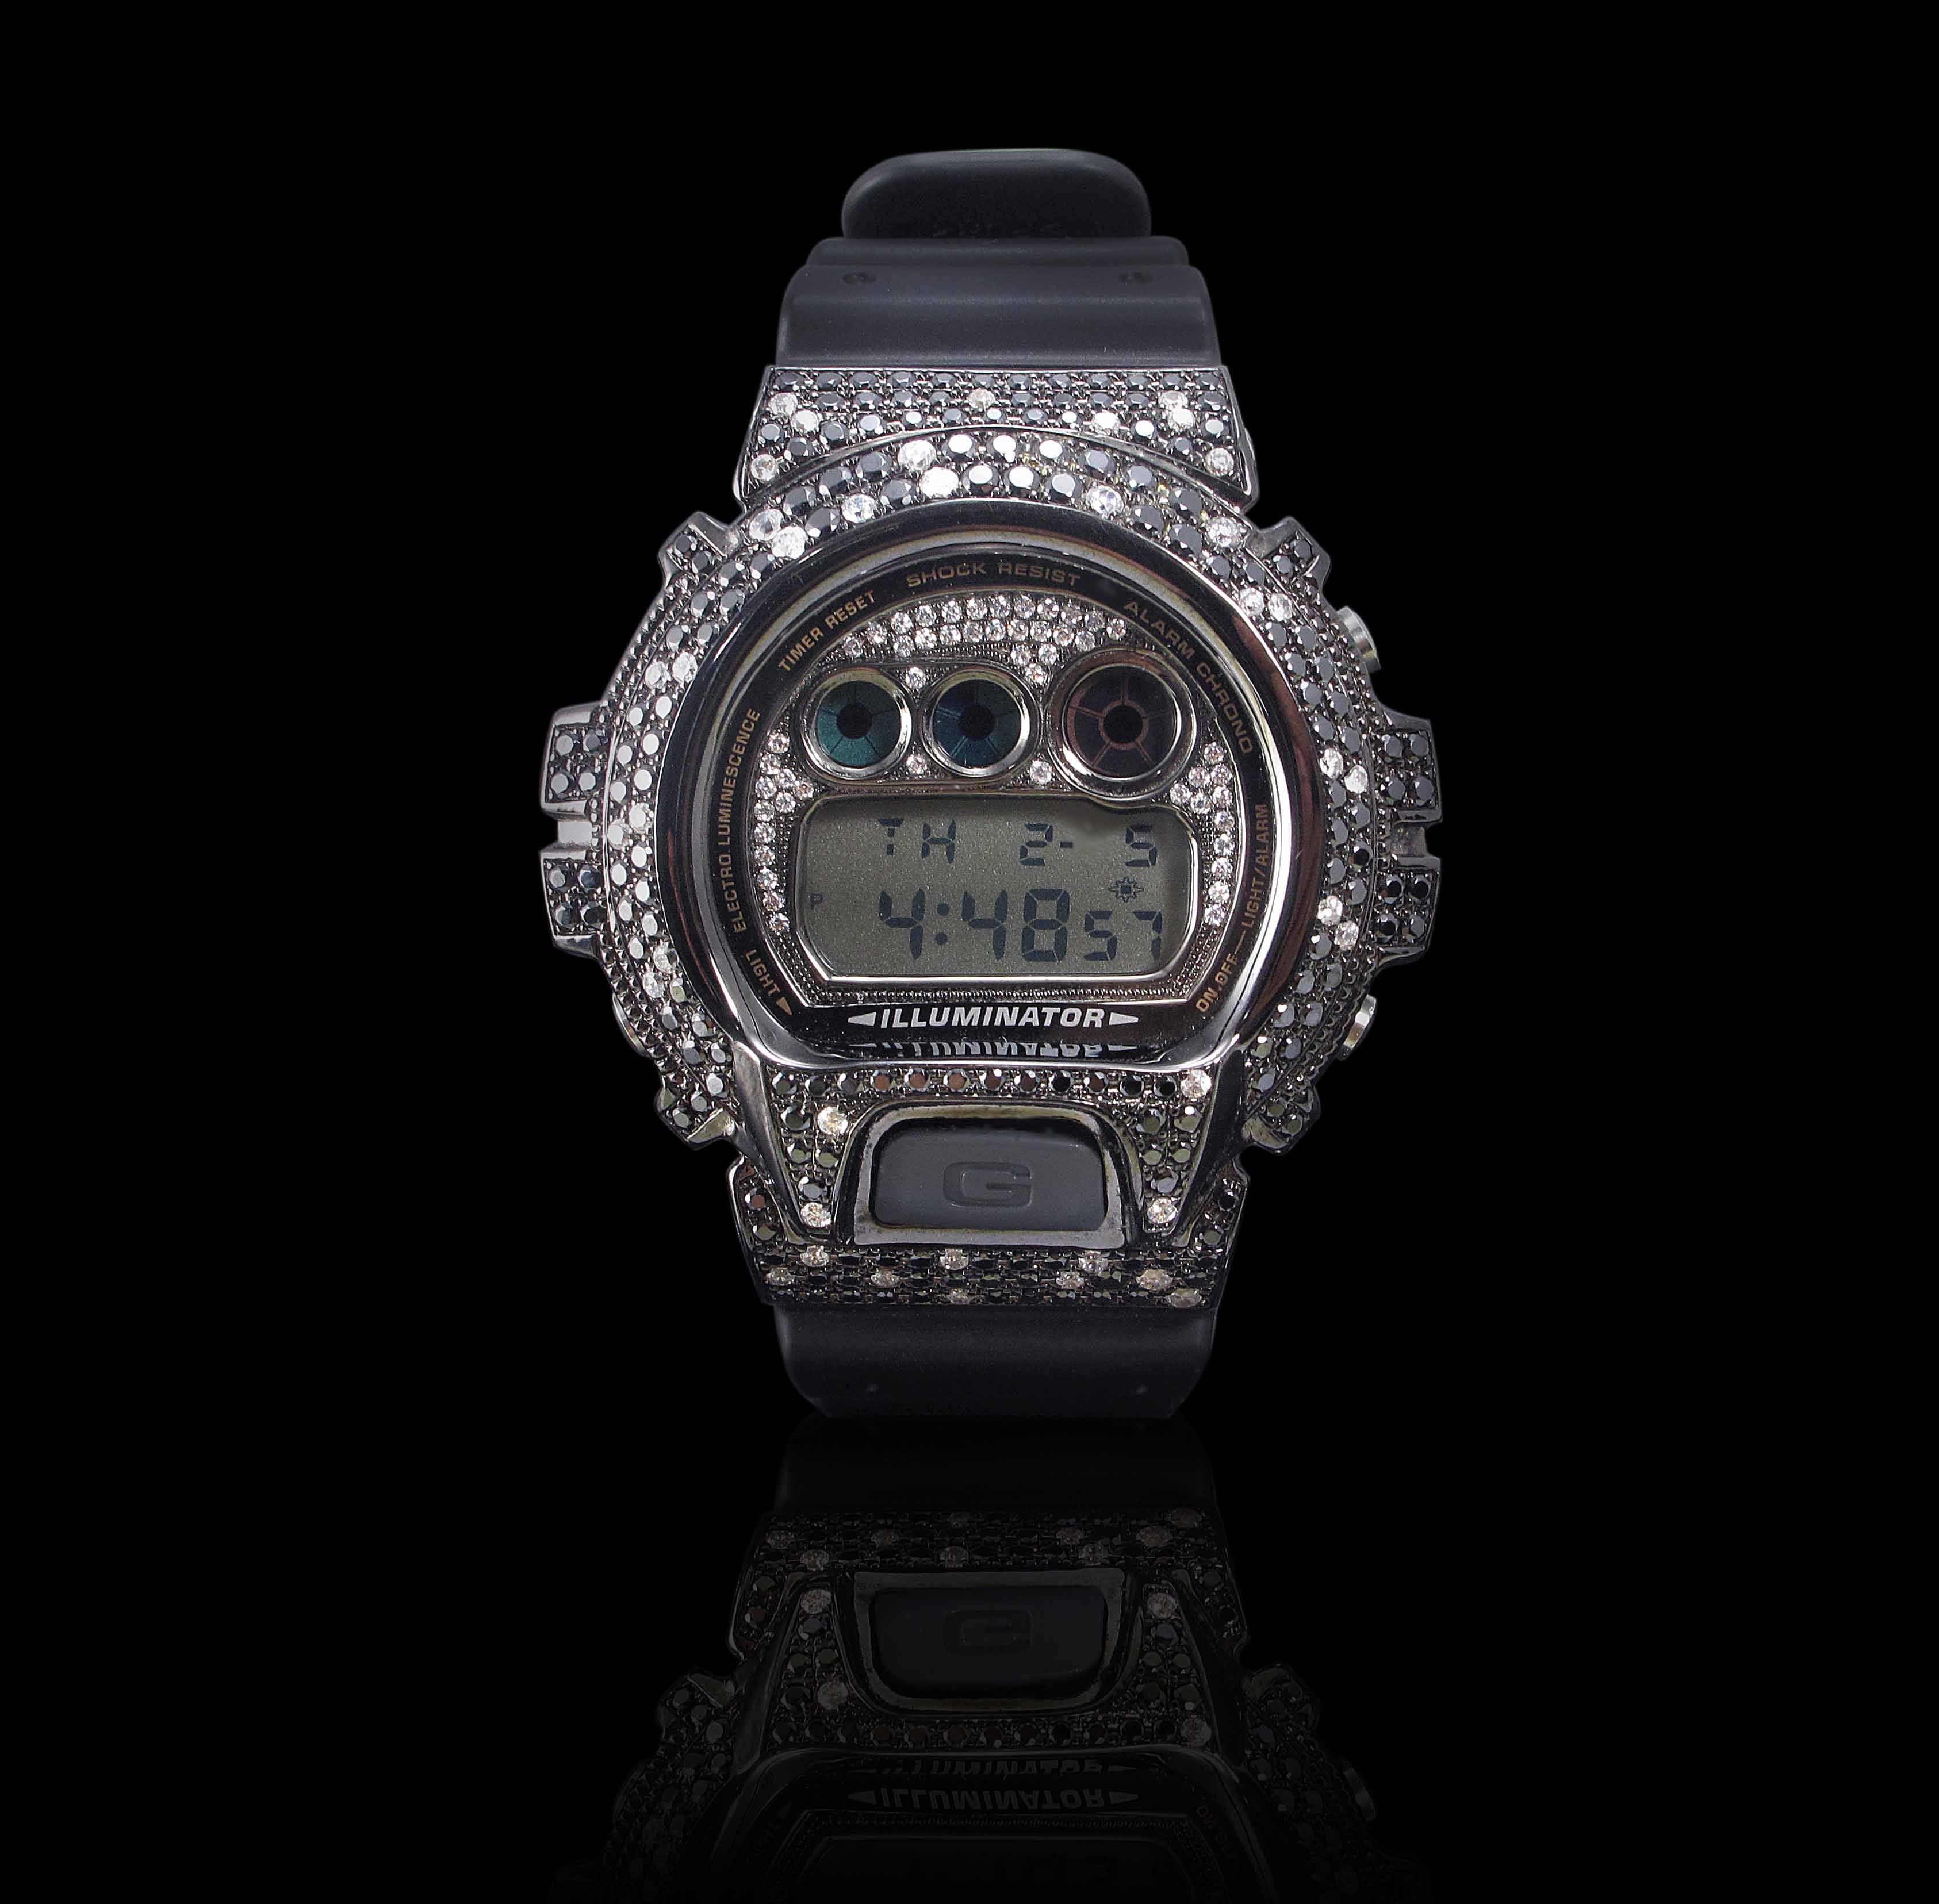 Silver 925 DW6900 Watch Case